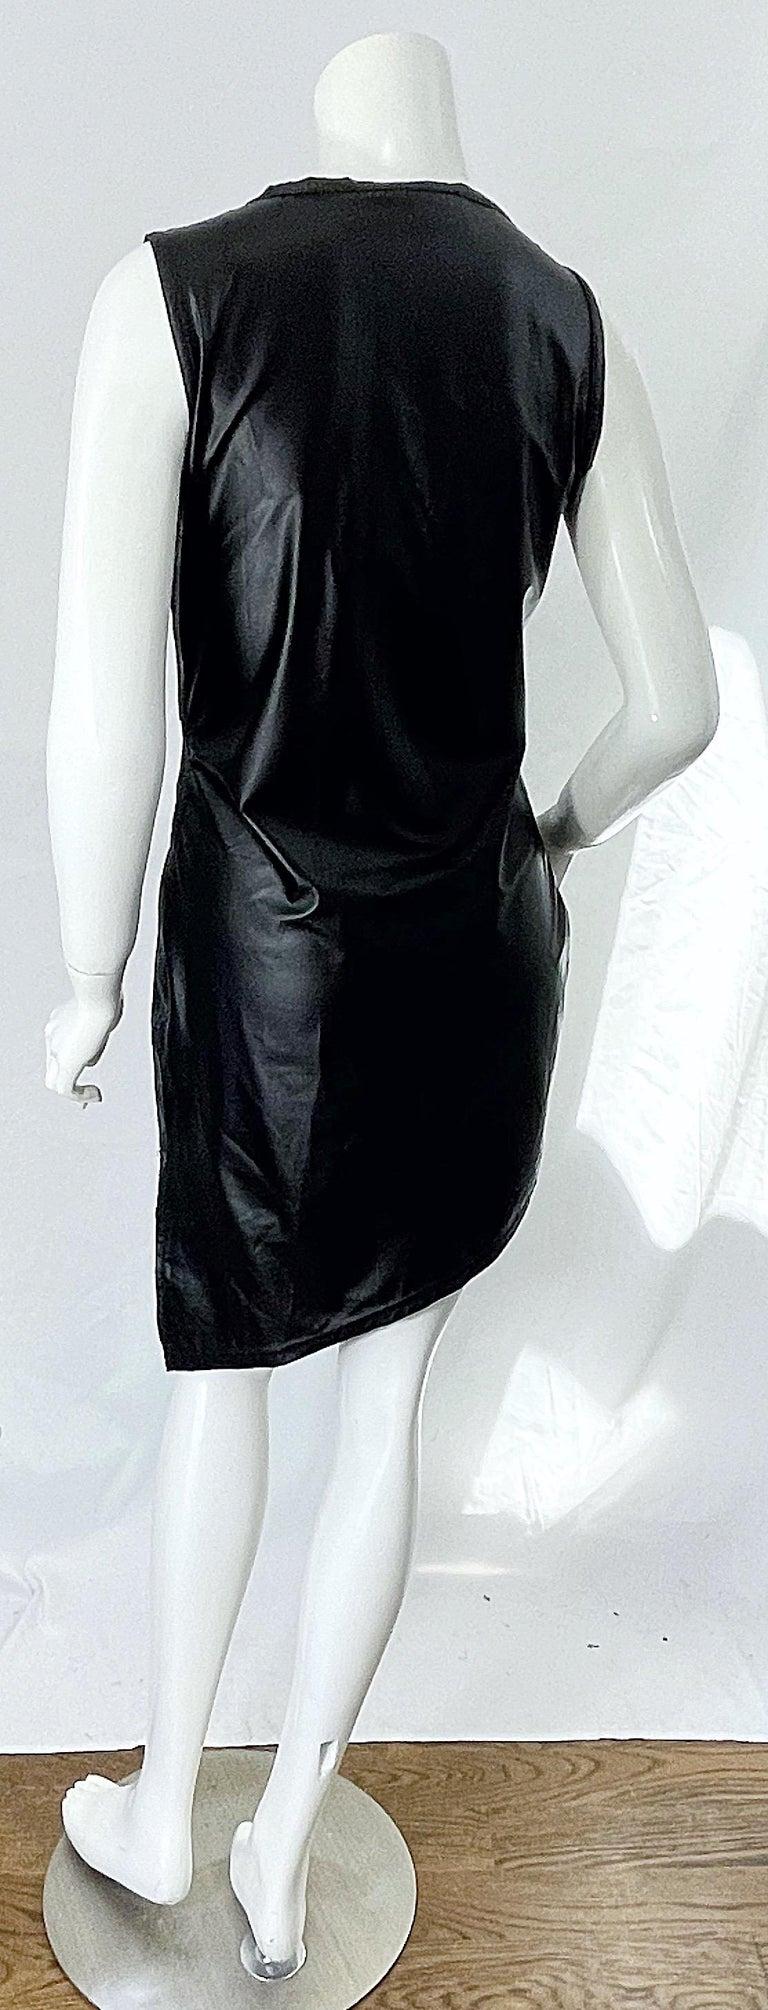 1990s Dexter Wong Club Kid Rave Japanese Black Pleather Vintage 90s Mini Dress For Sale 9